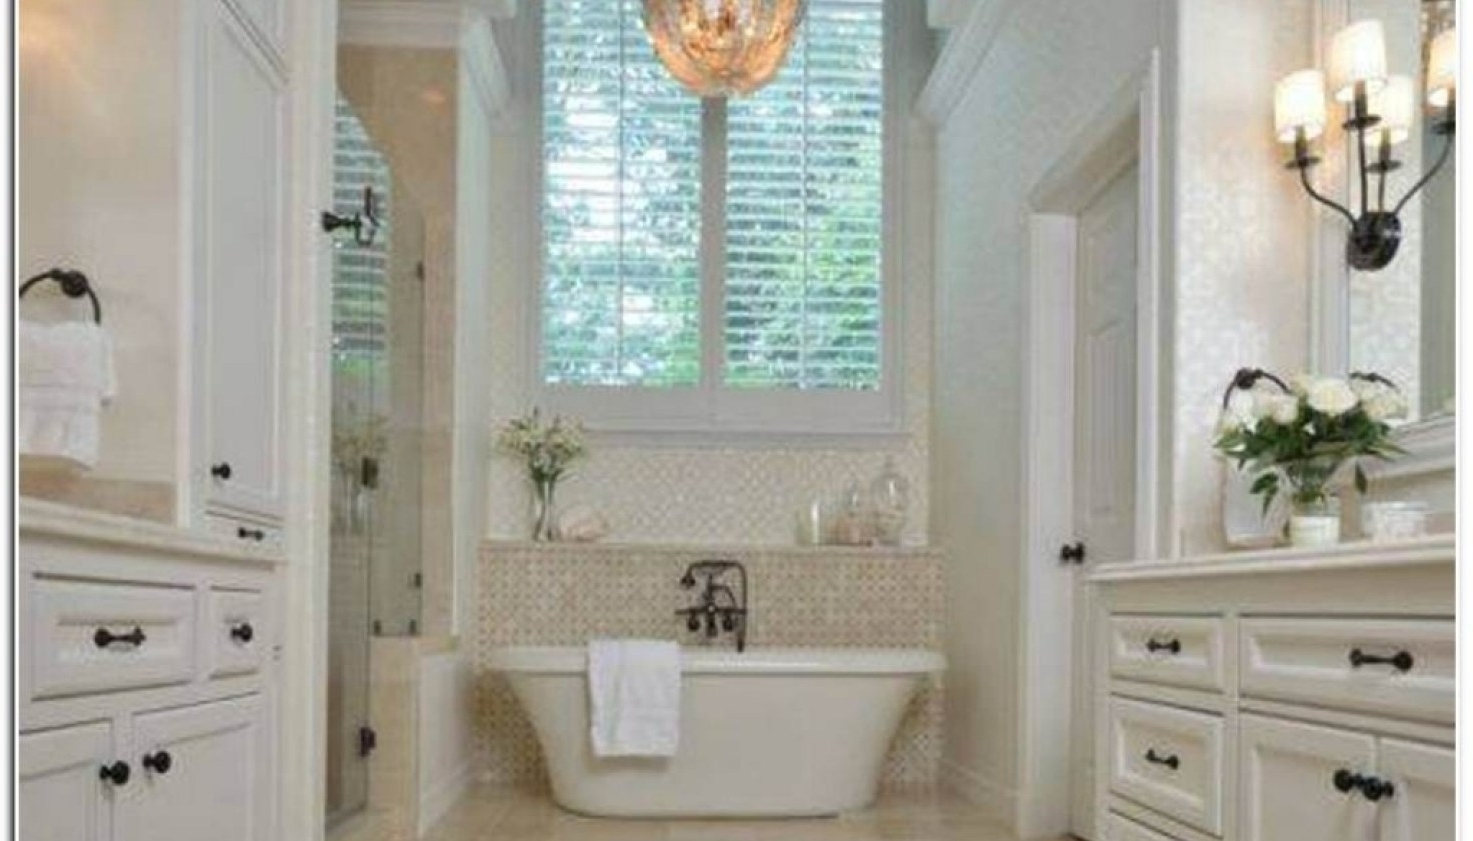 Trendy Chandelier : Chandeliers For Bathrooms Surprising Master Bathroom With Regard To Chandeliers For Bathrooms (View 16 of 20)